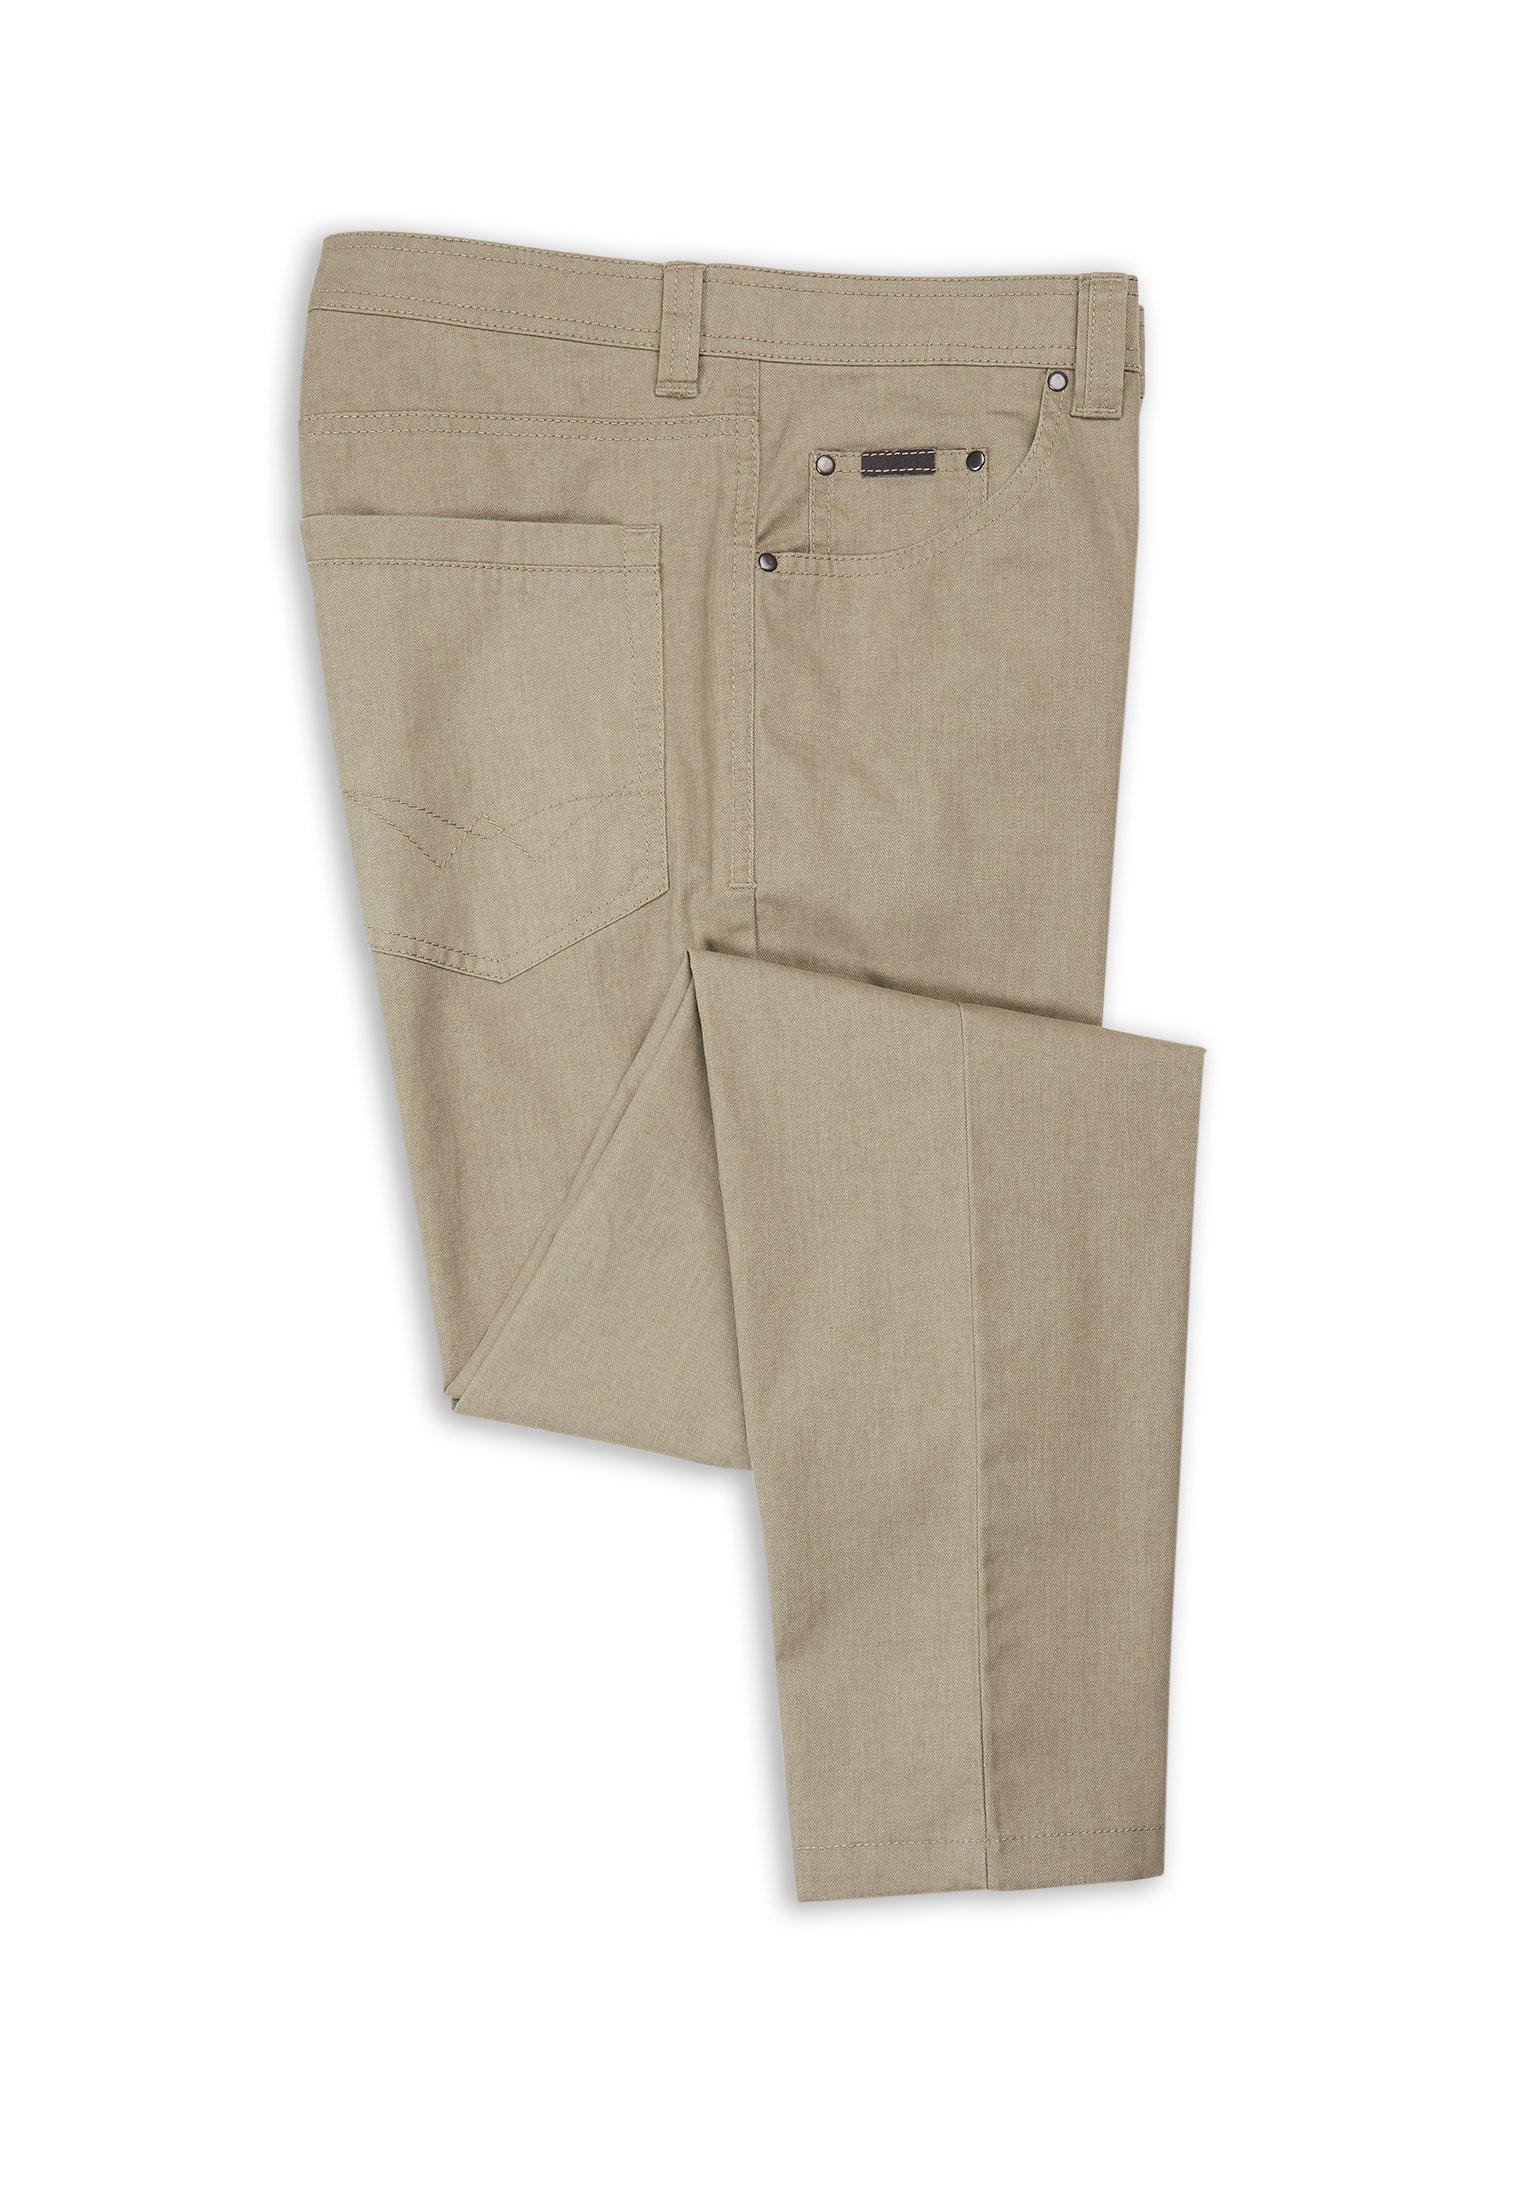 Sage Basildon Tailored Fit Trouser